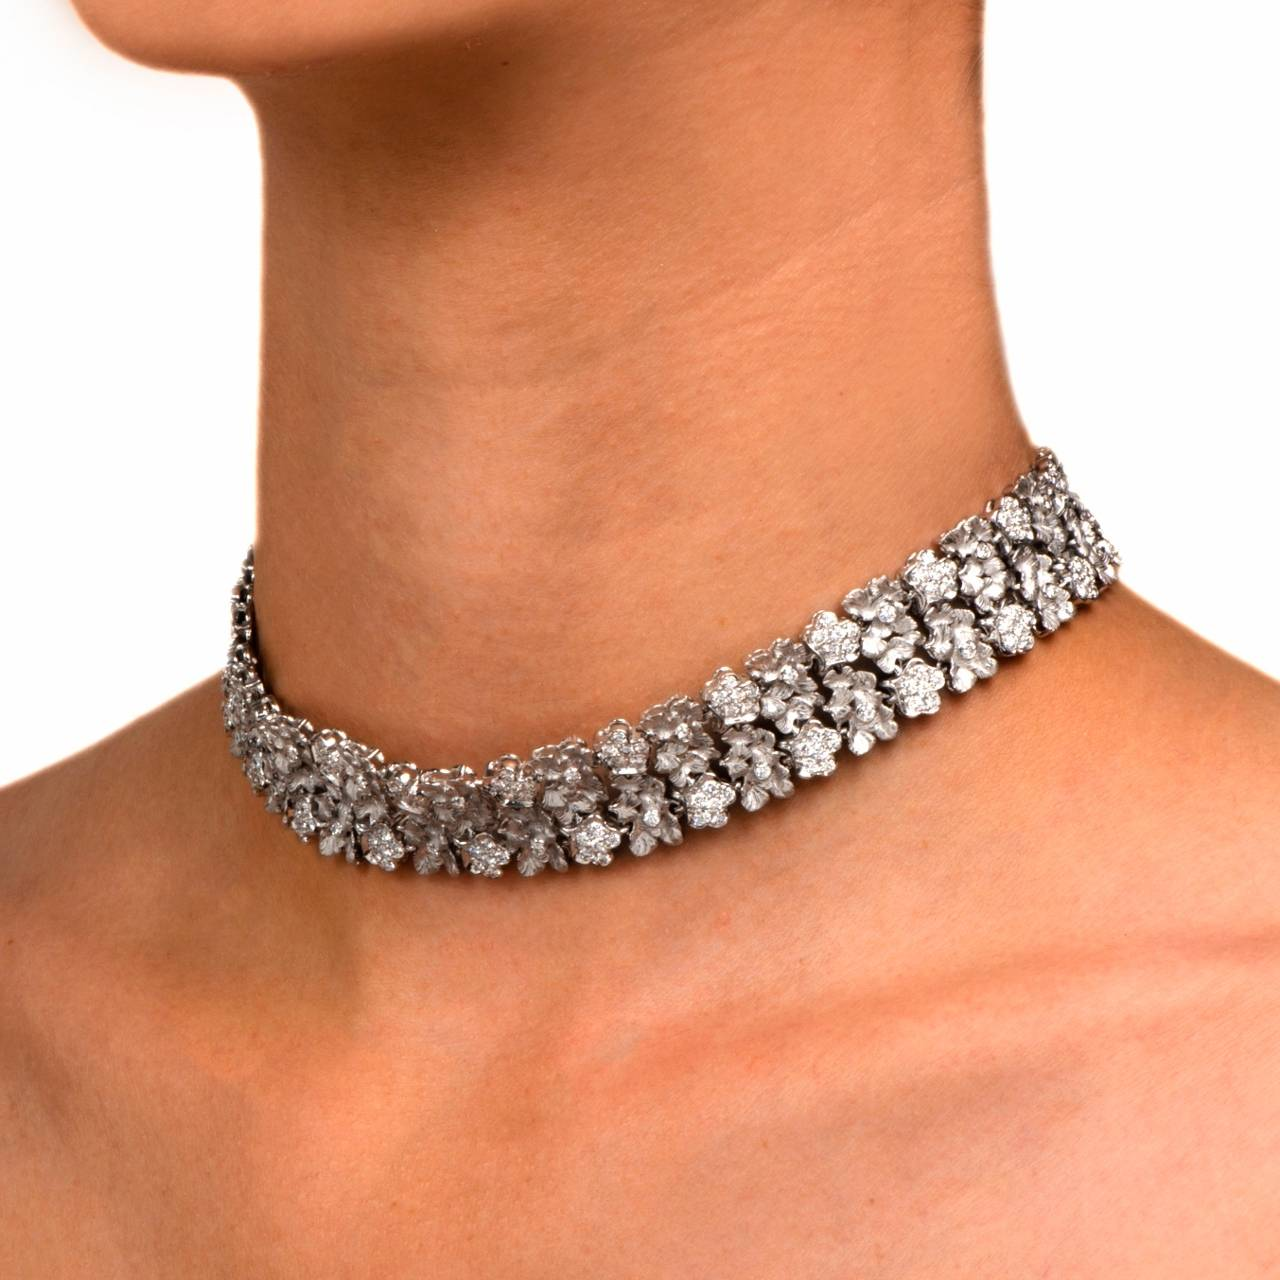 Single Diamond Choker Necklace